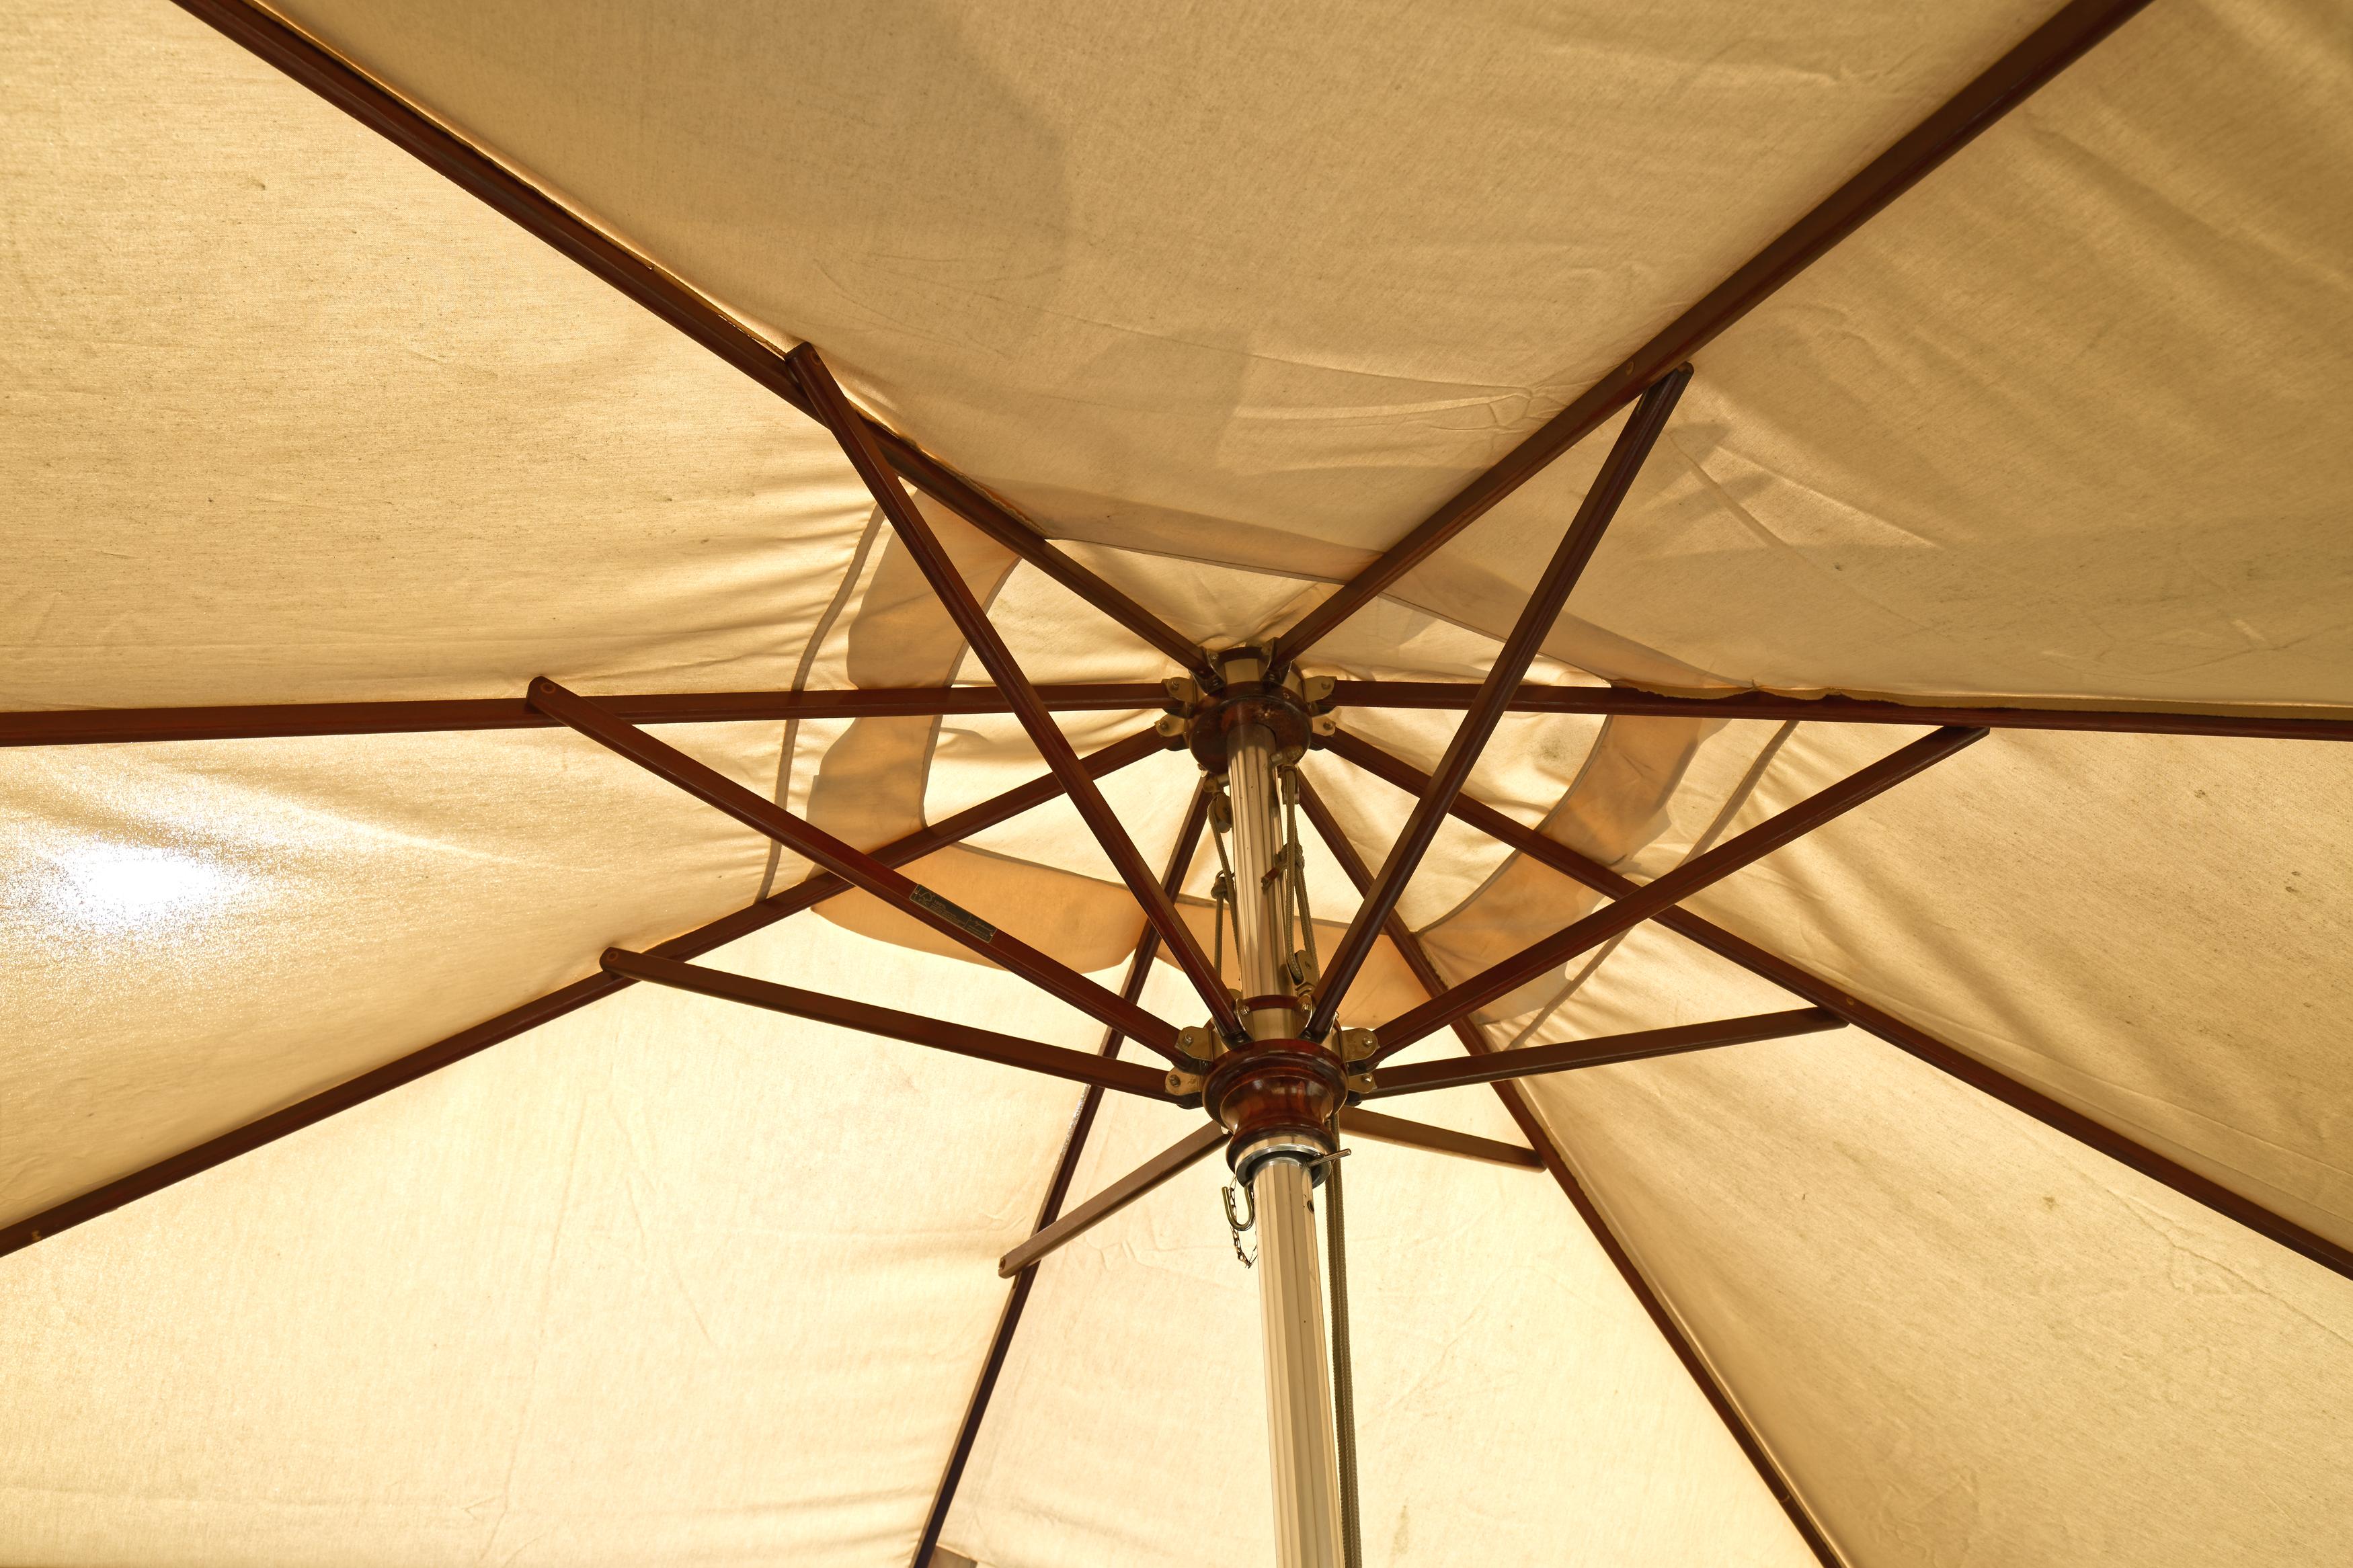 File:Garden patio umbrella.jpg - Wikimedia Commons